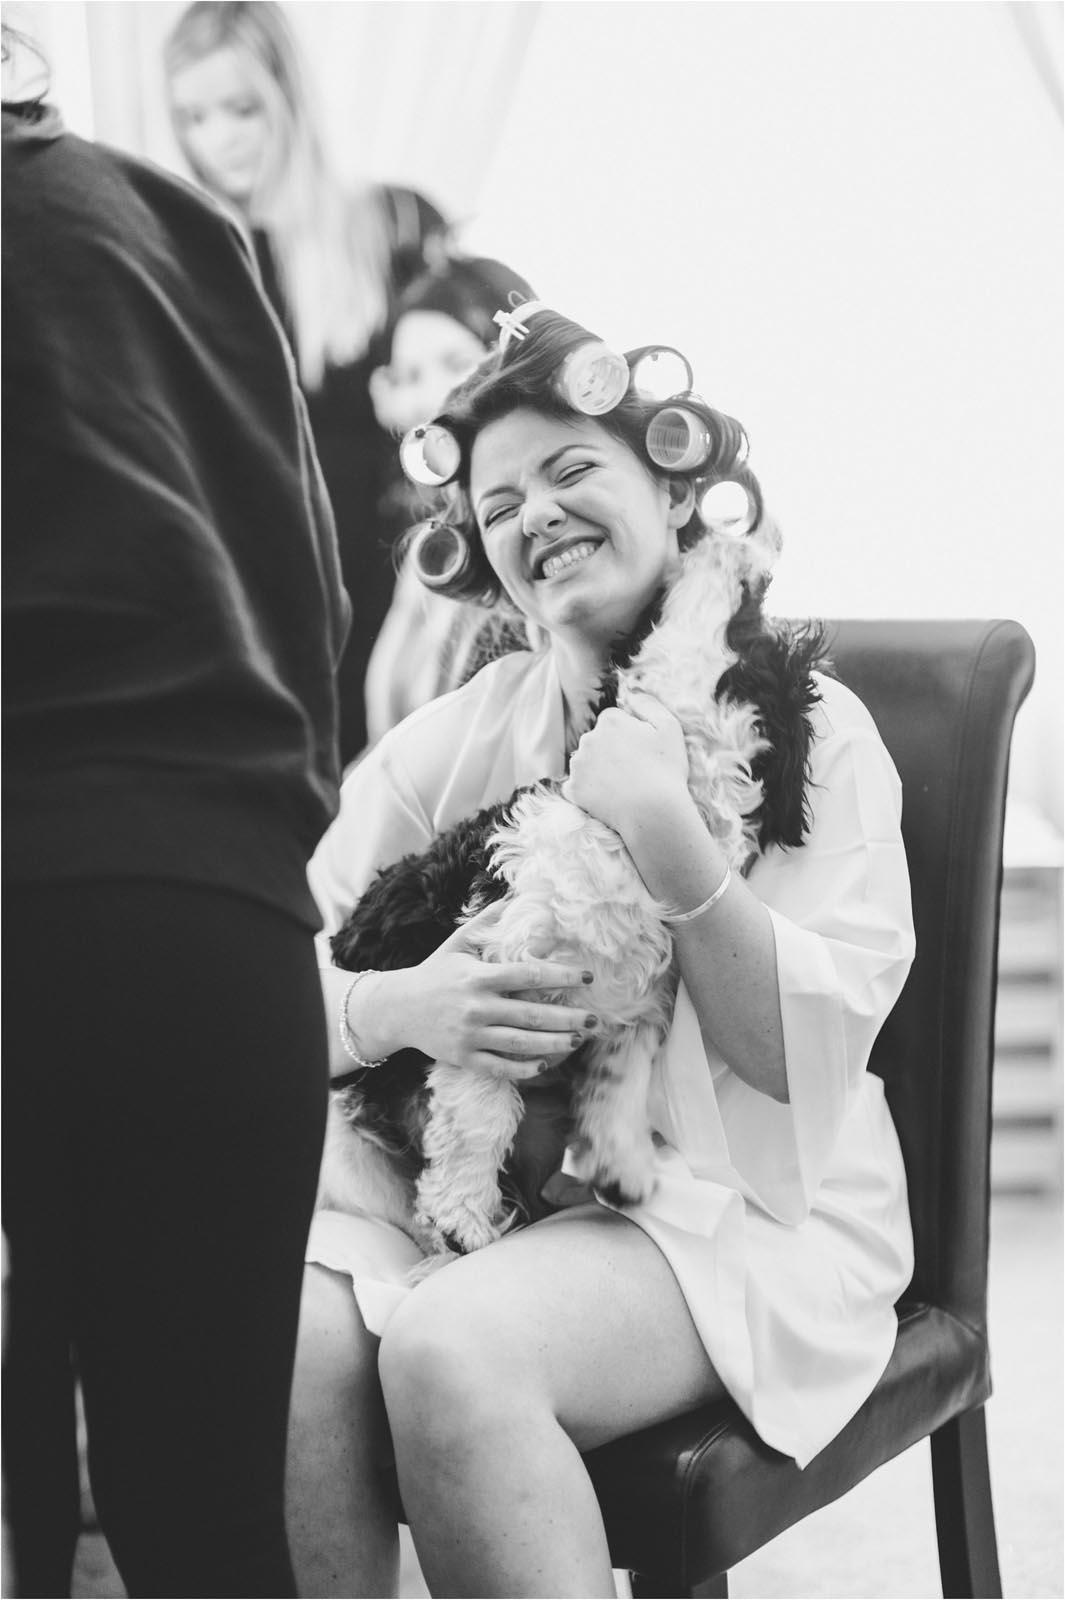 Dog licking bride